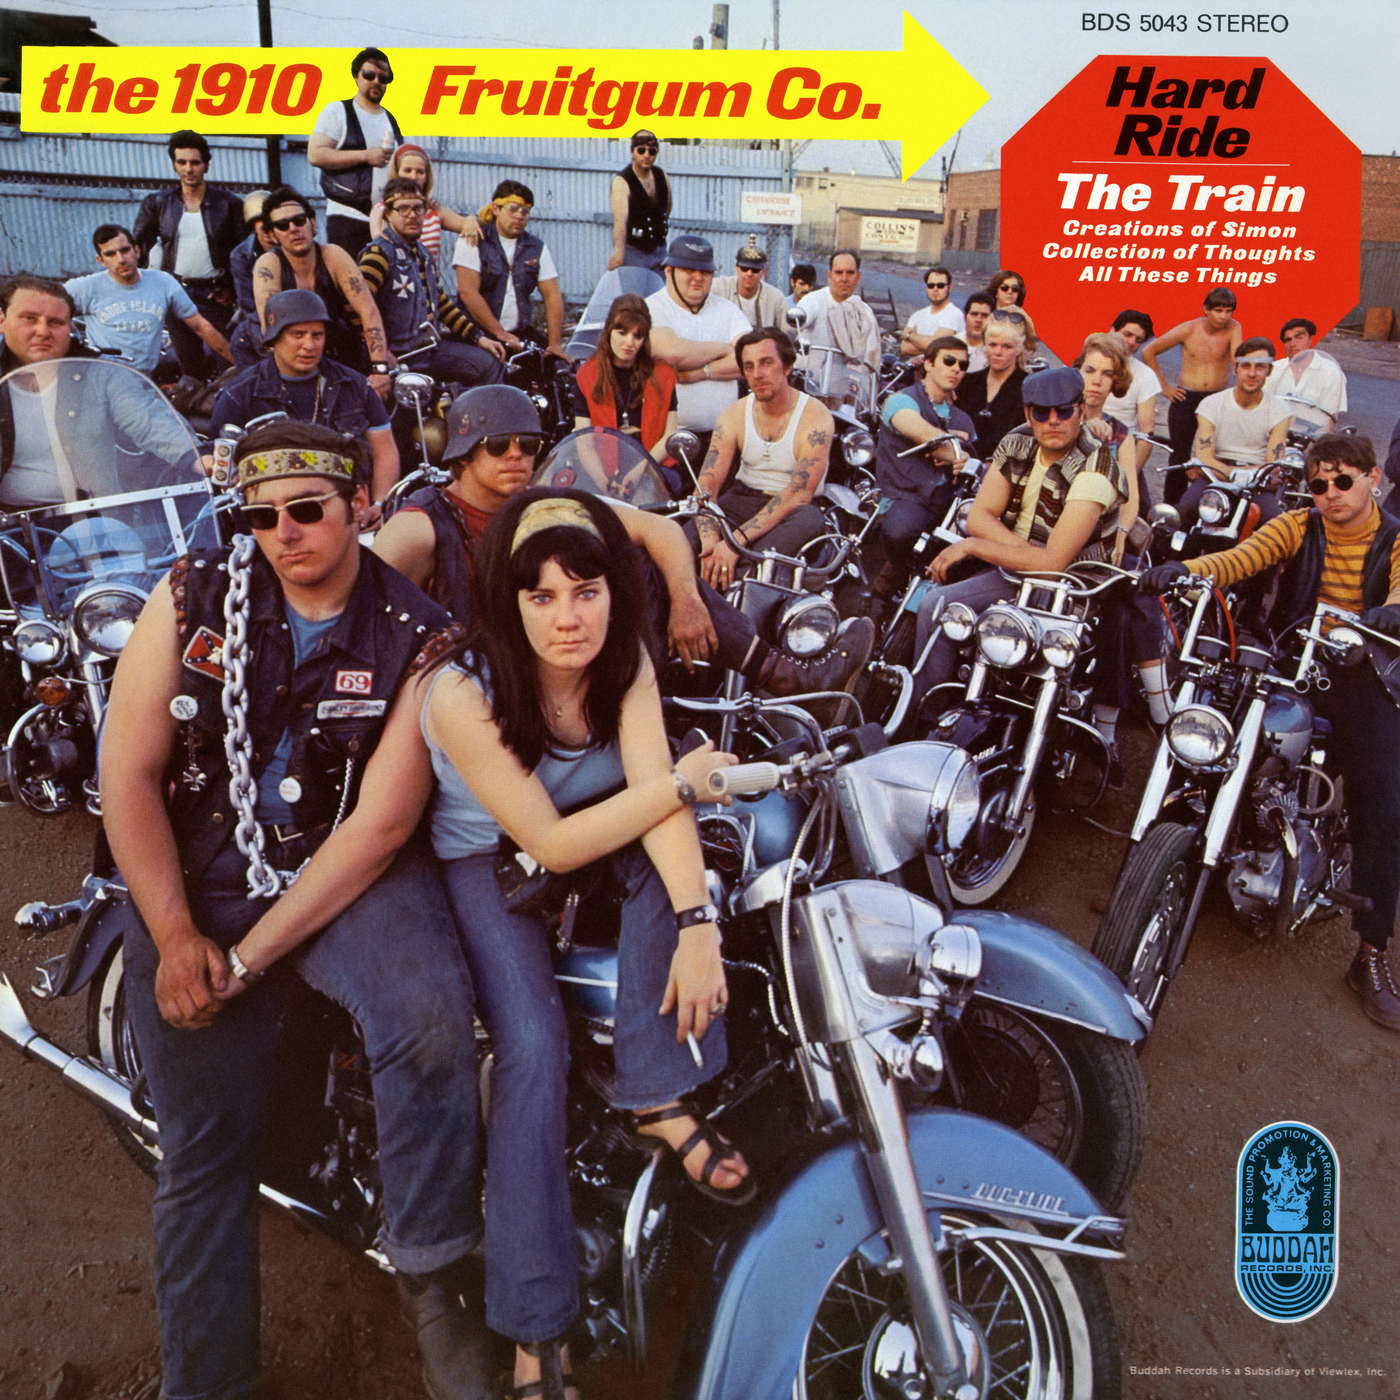 Hard Ride - 1910 Fruitgum Company